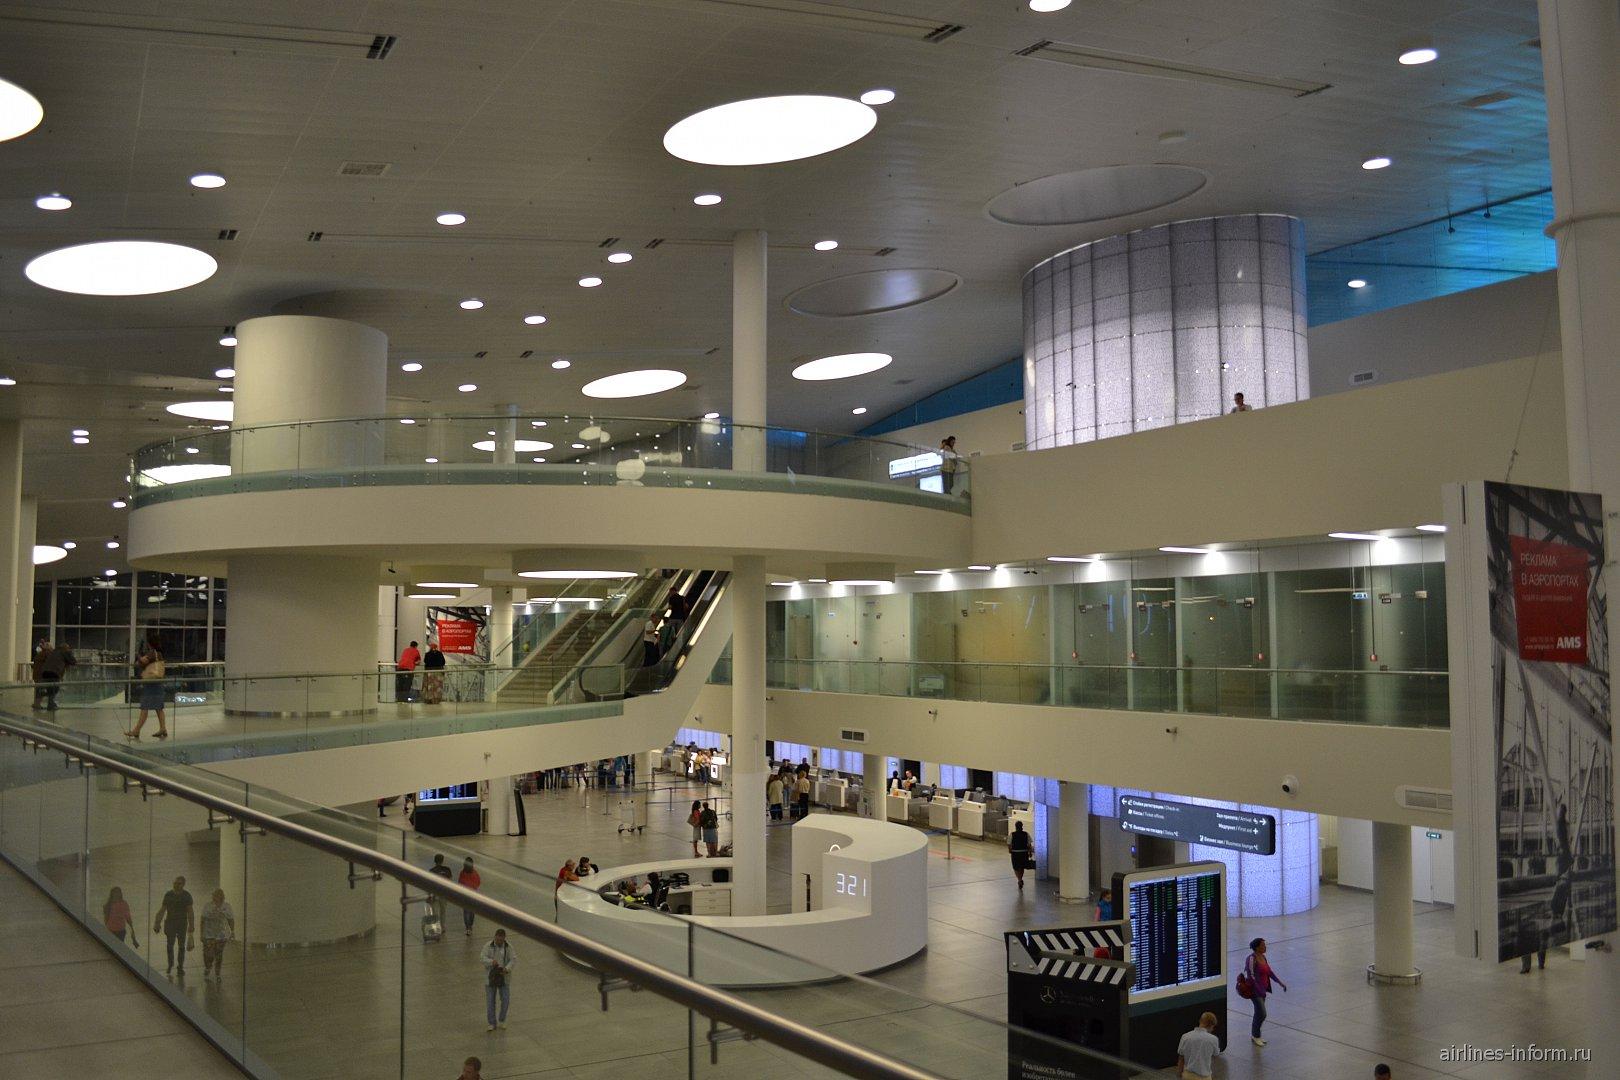 В пассажирском терминале аэропорта Самара Курумоч